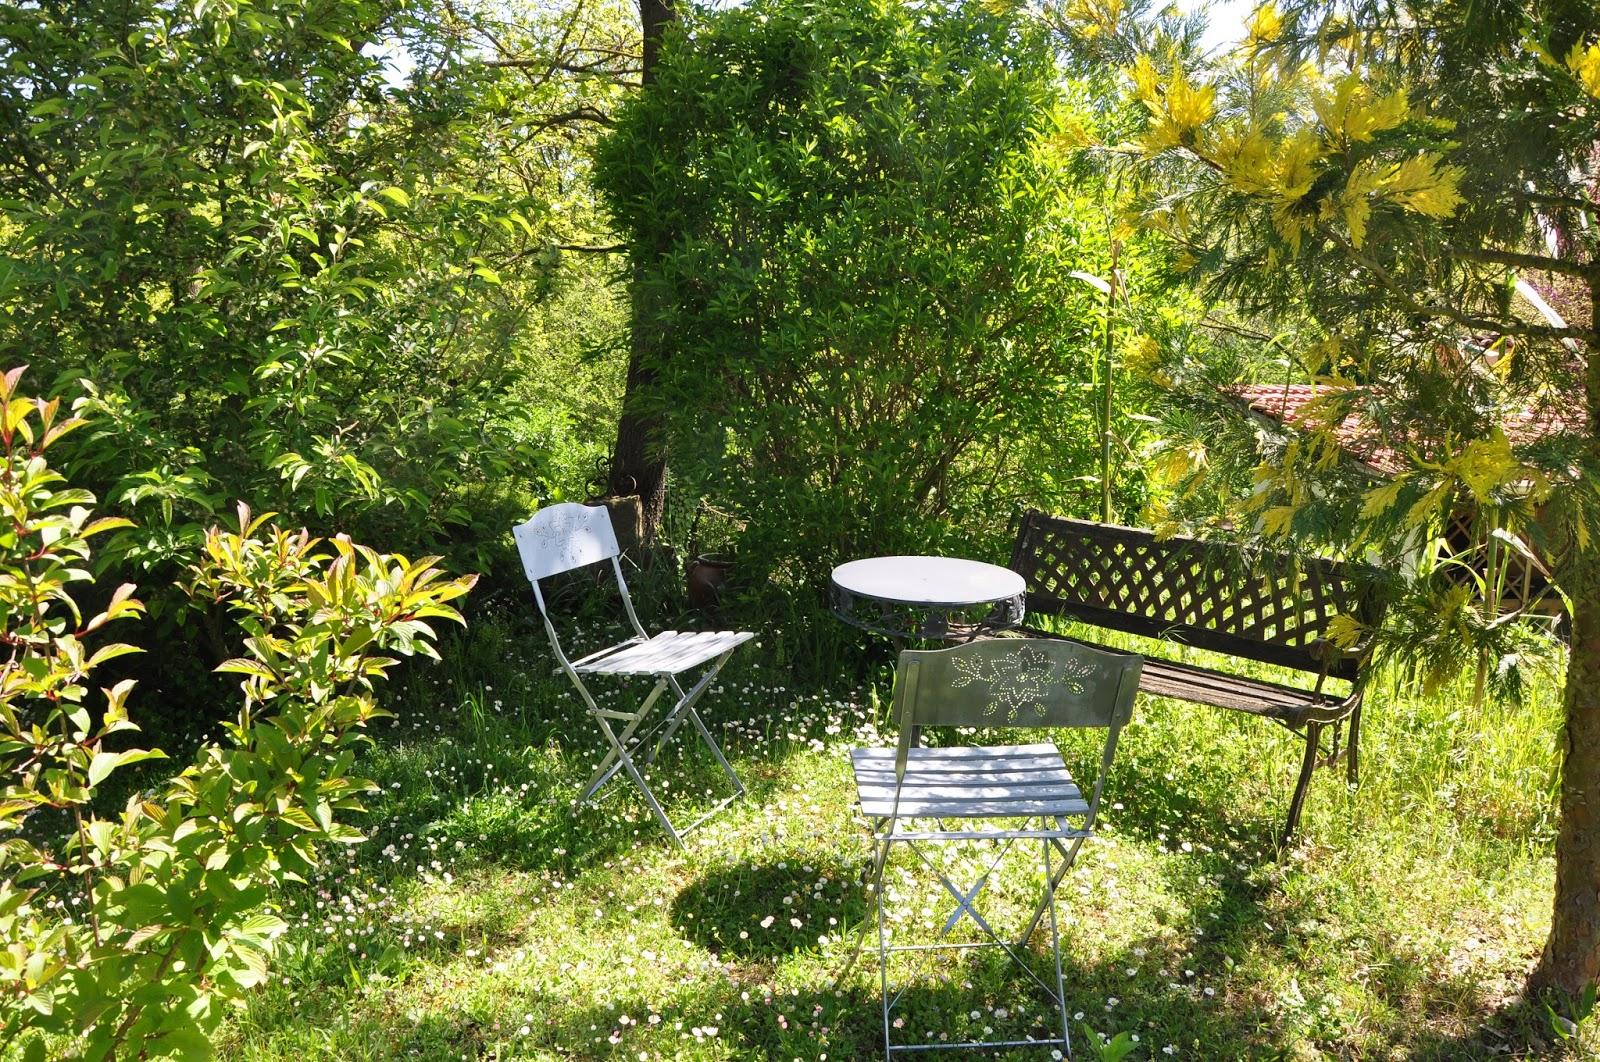 Le jardin du bois joli for Dans mon jardin secret